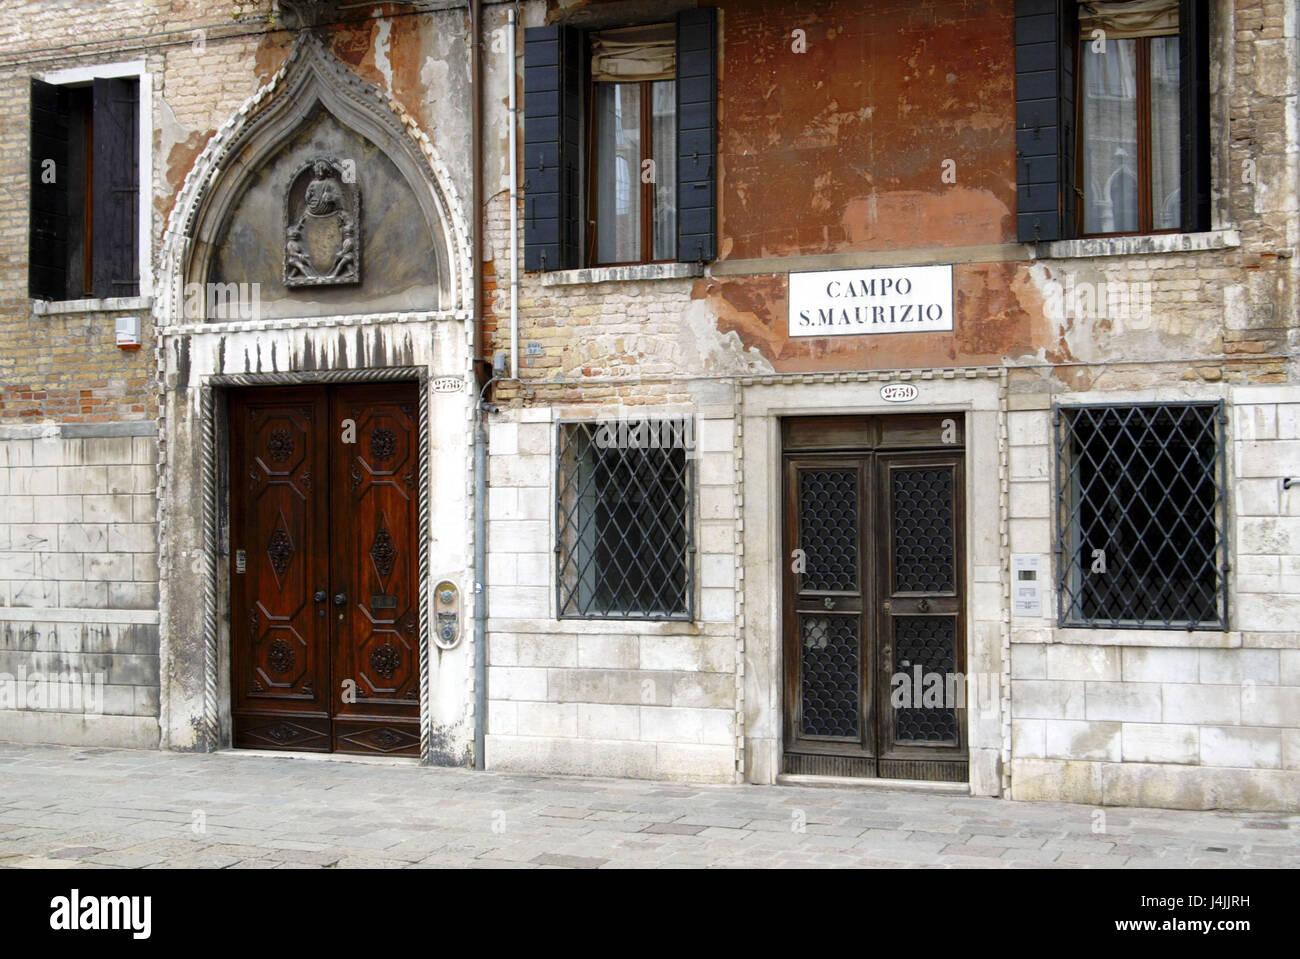 Italien Venedig Campo San Maurizio Hausfassade Alte Kaputte